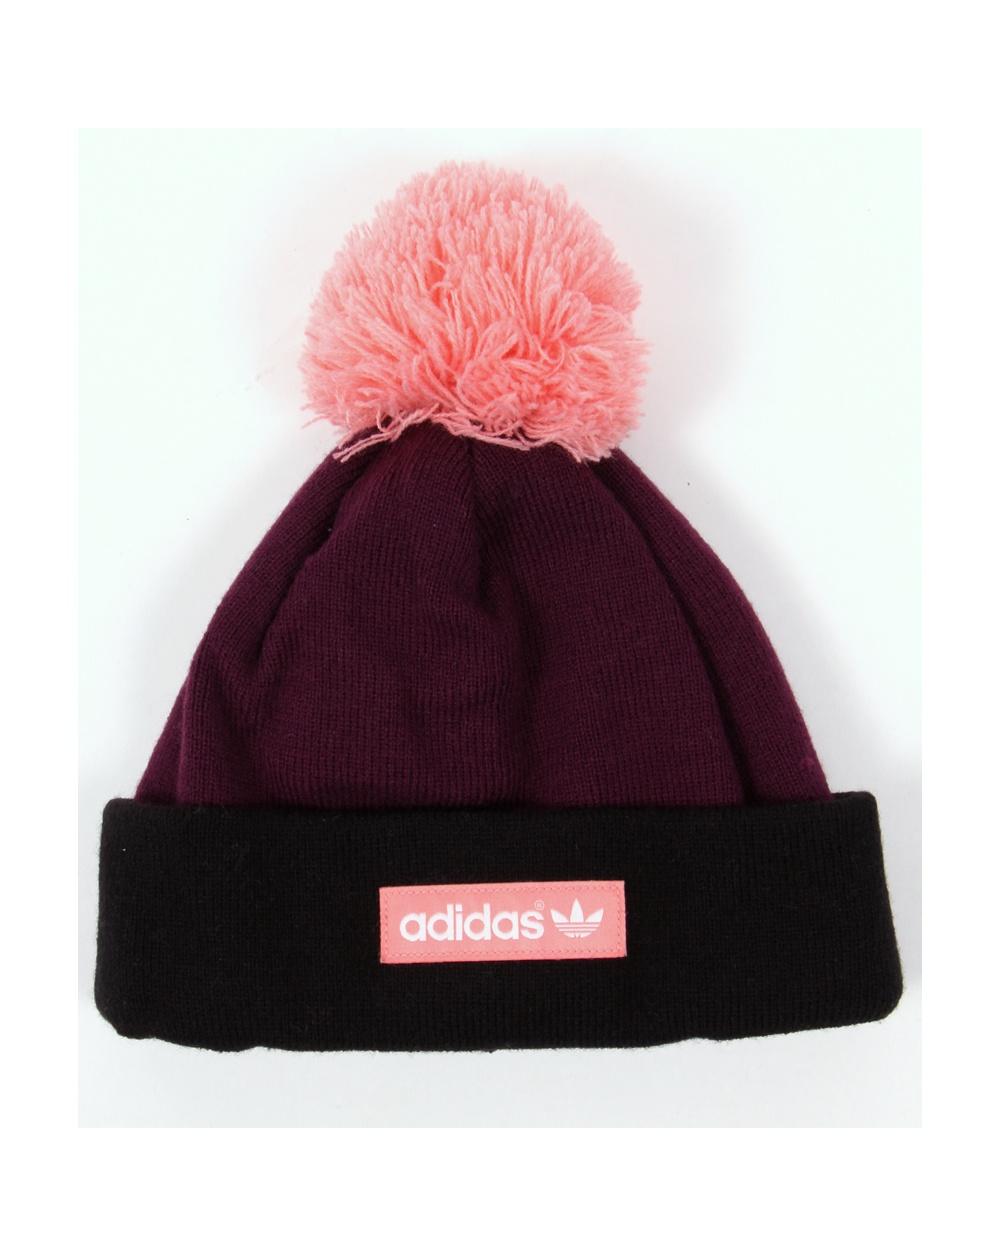 3ea37546574af ... usa adidas originals woven logo beanie purple black pink 771d4 55052